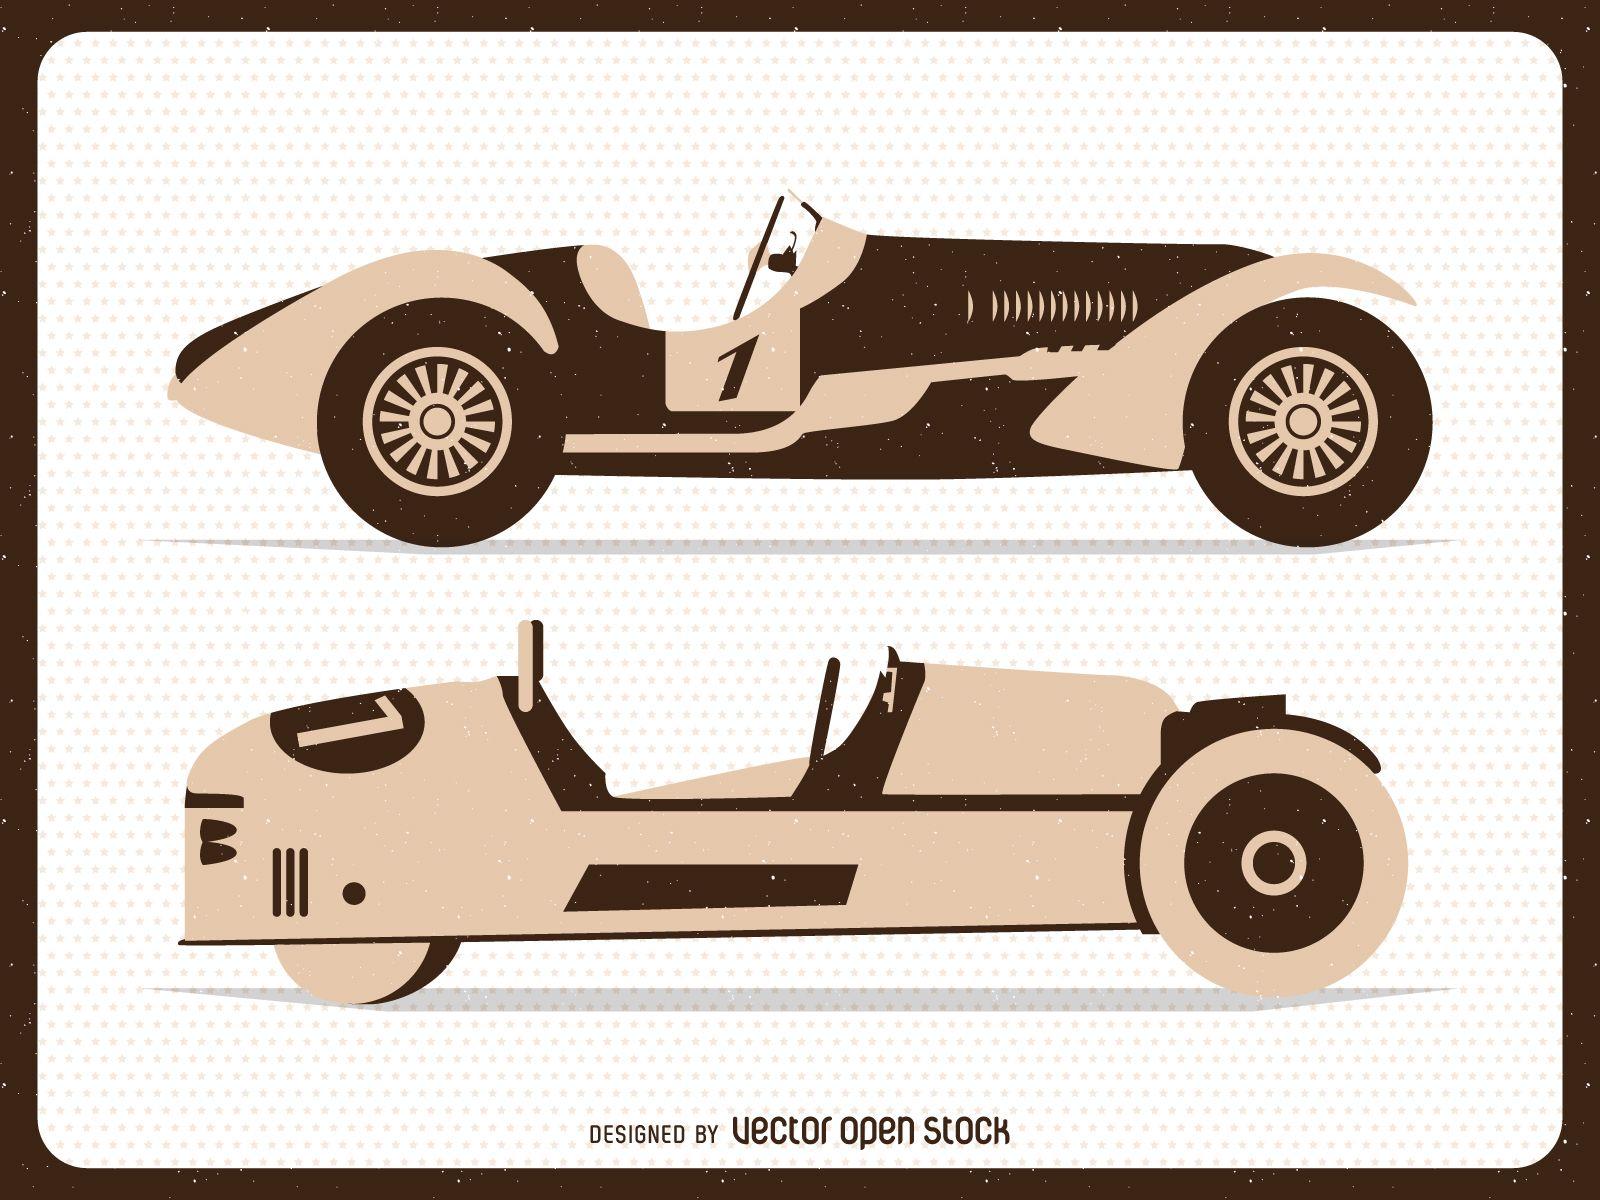 Vintage flat racing cars illustrations - Vector download